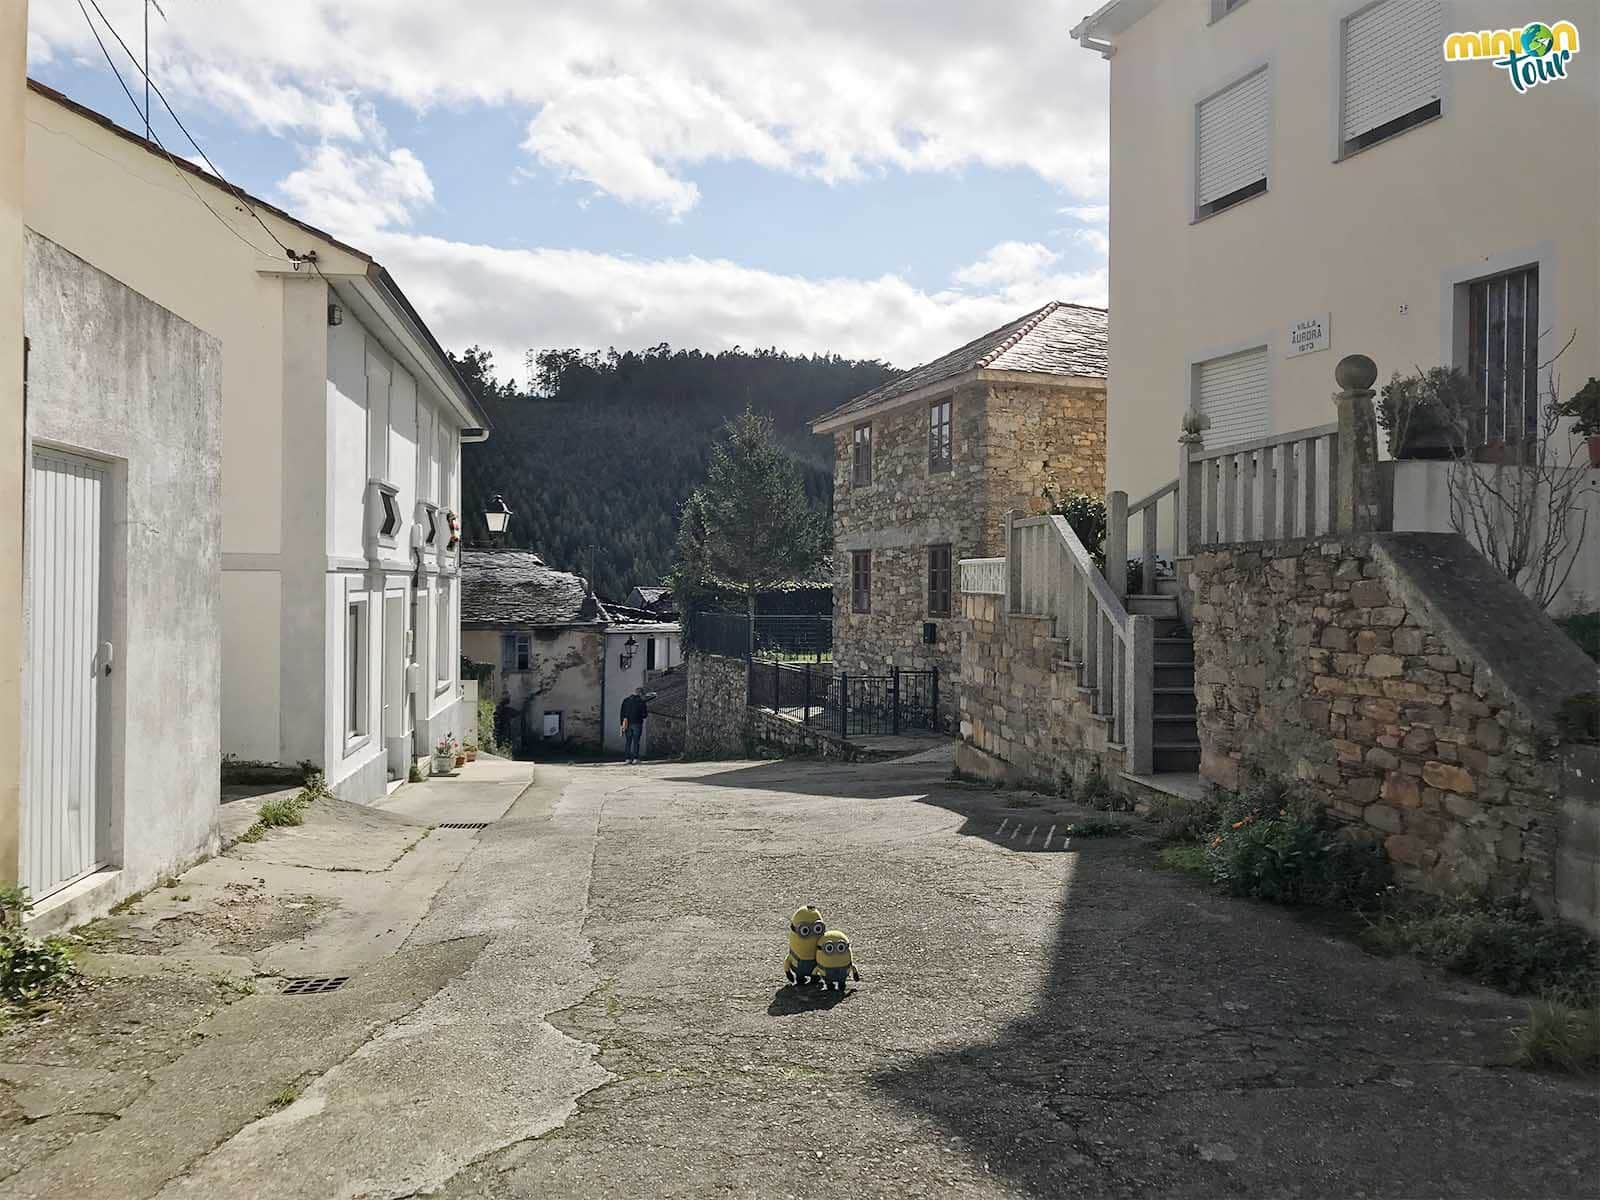 Minions paseando por las calles de San Martín de Mondoñedo